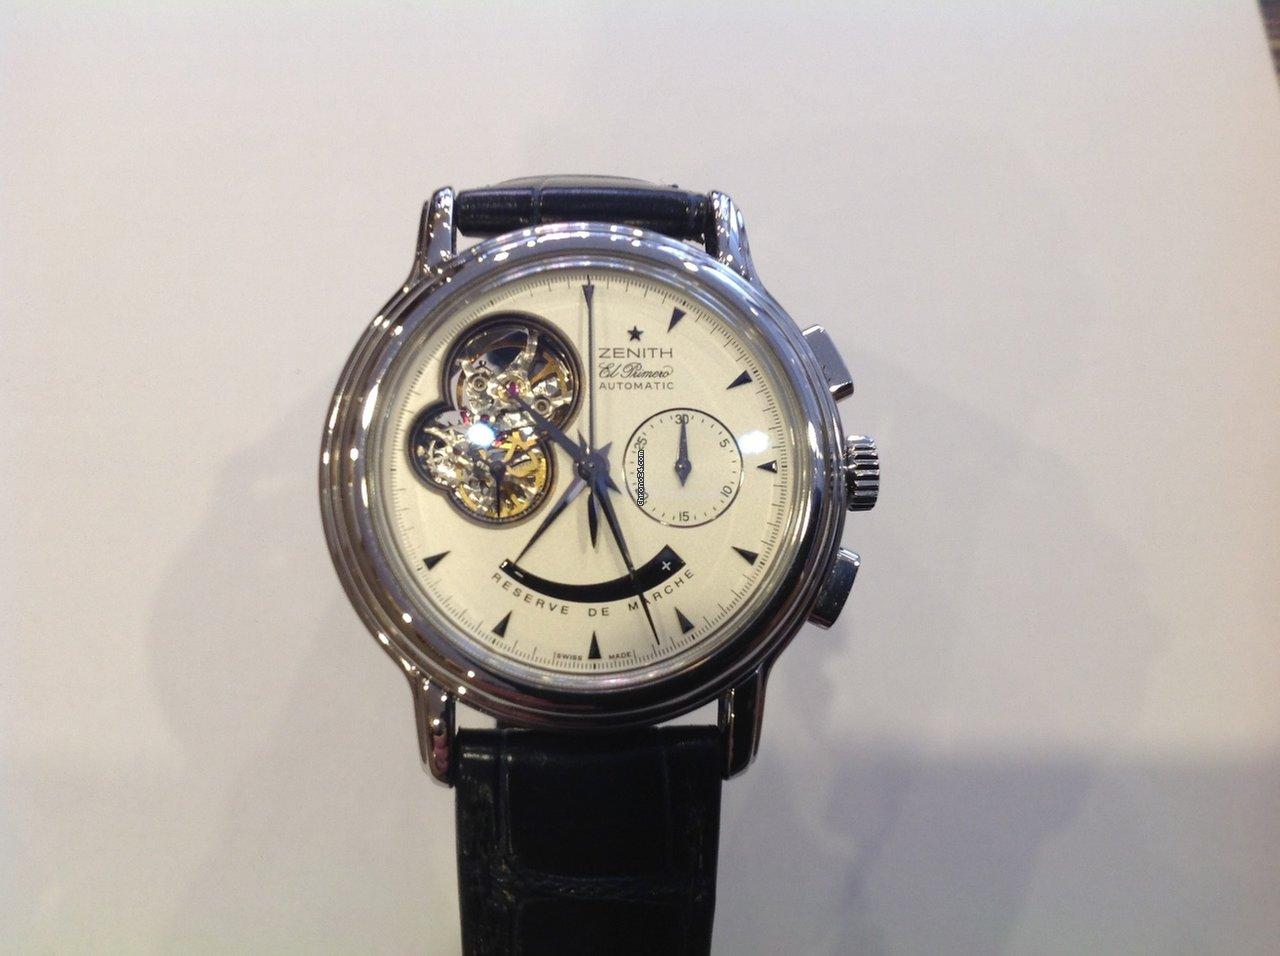 fabcdb79926 Relógios Zenith usados - Compare os preços de relógios Zenith usados